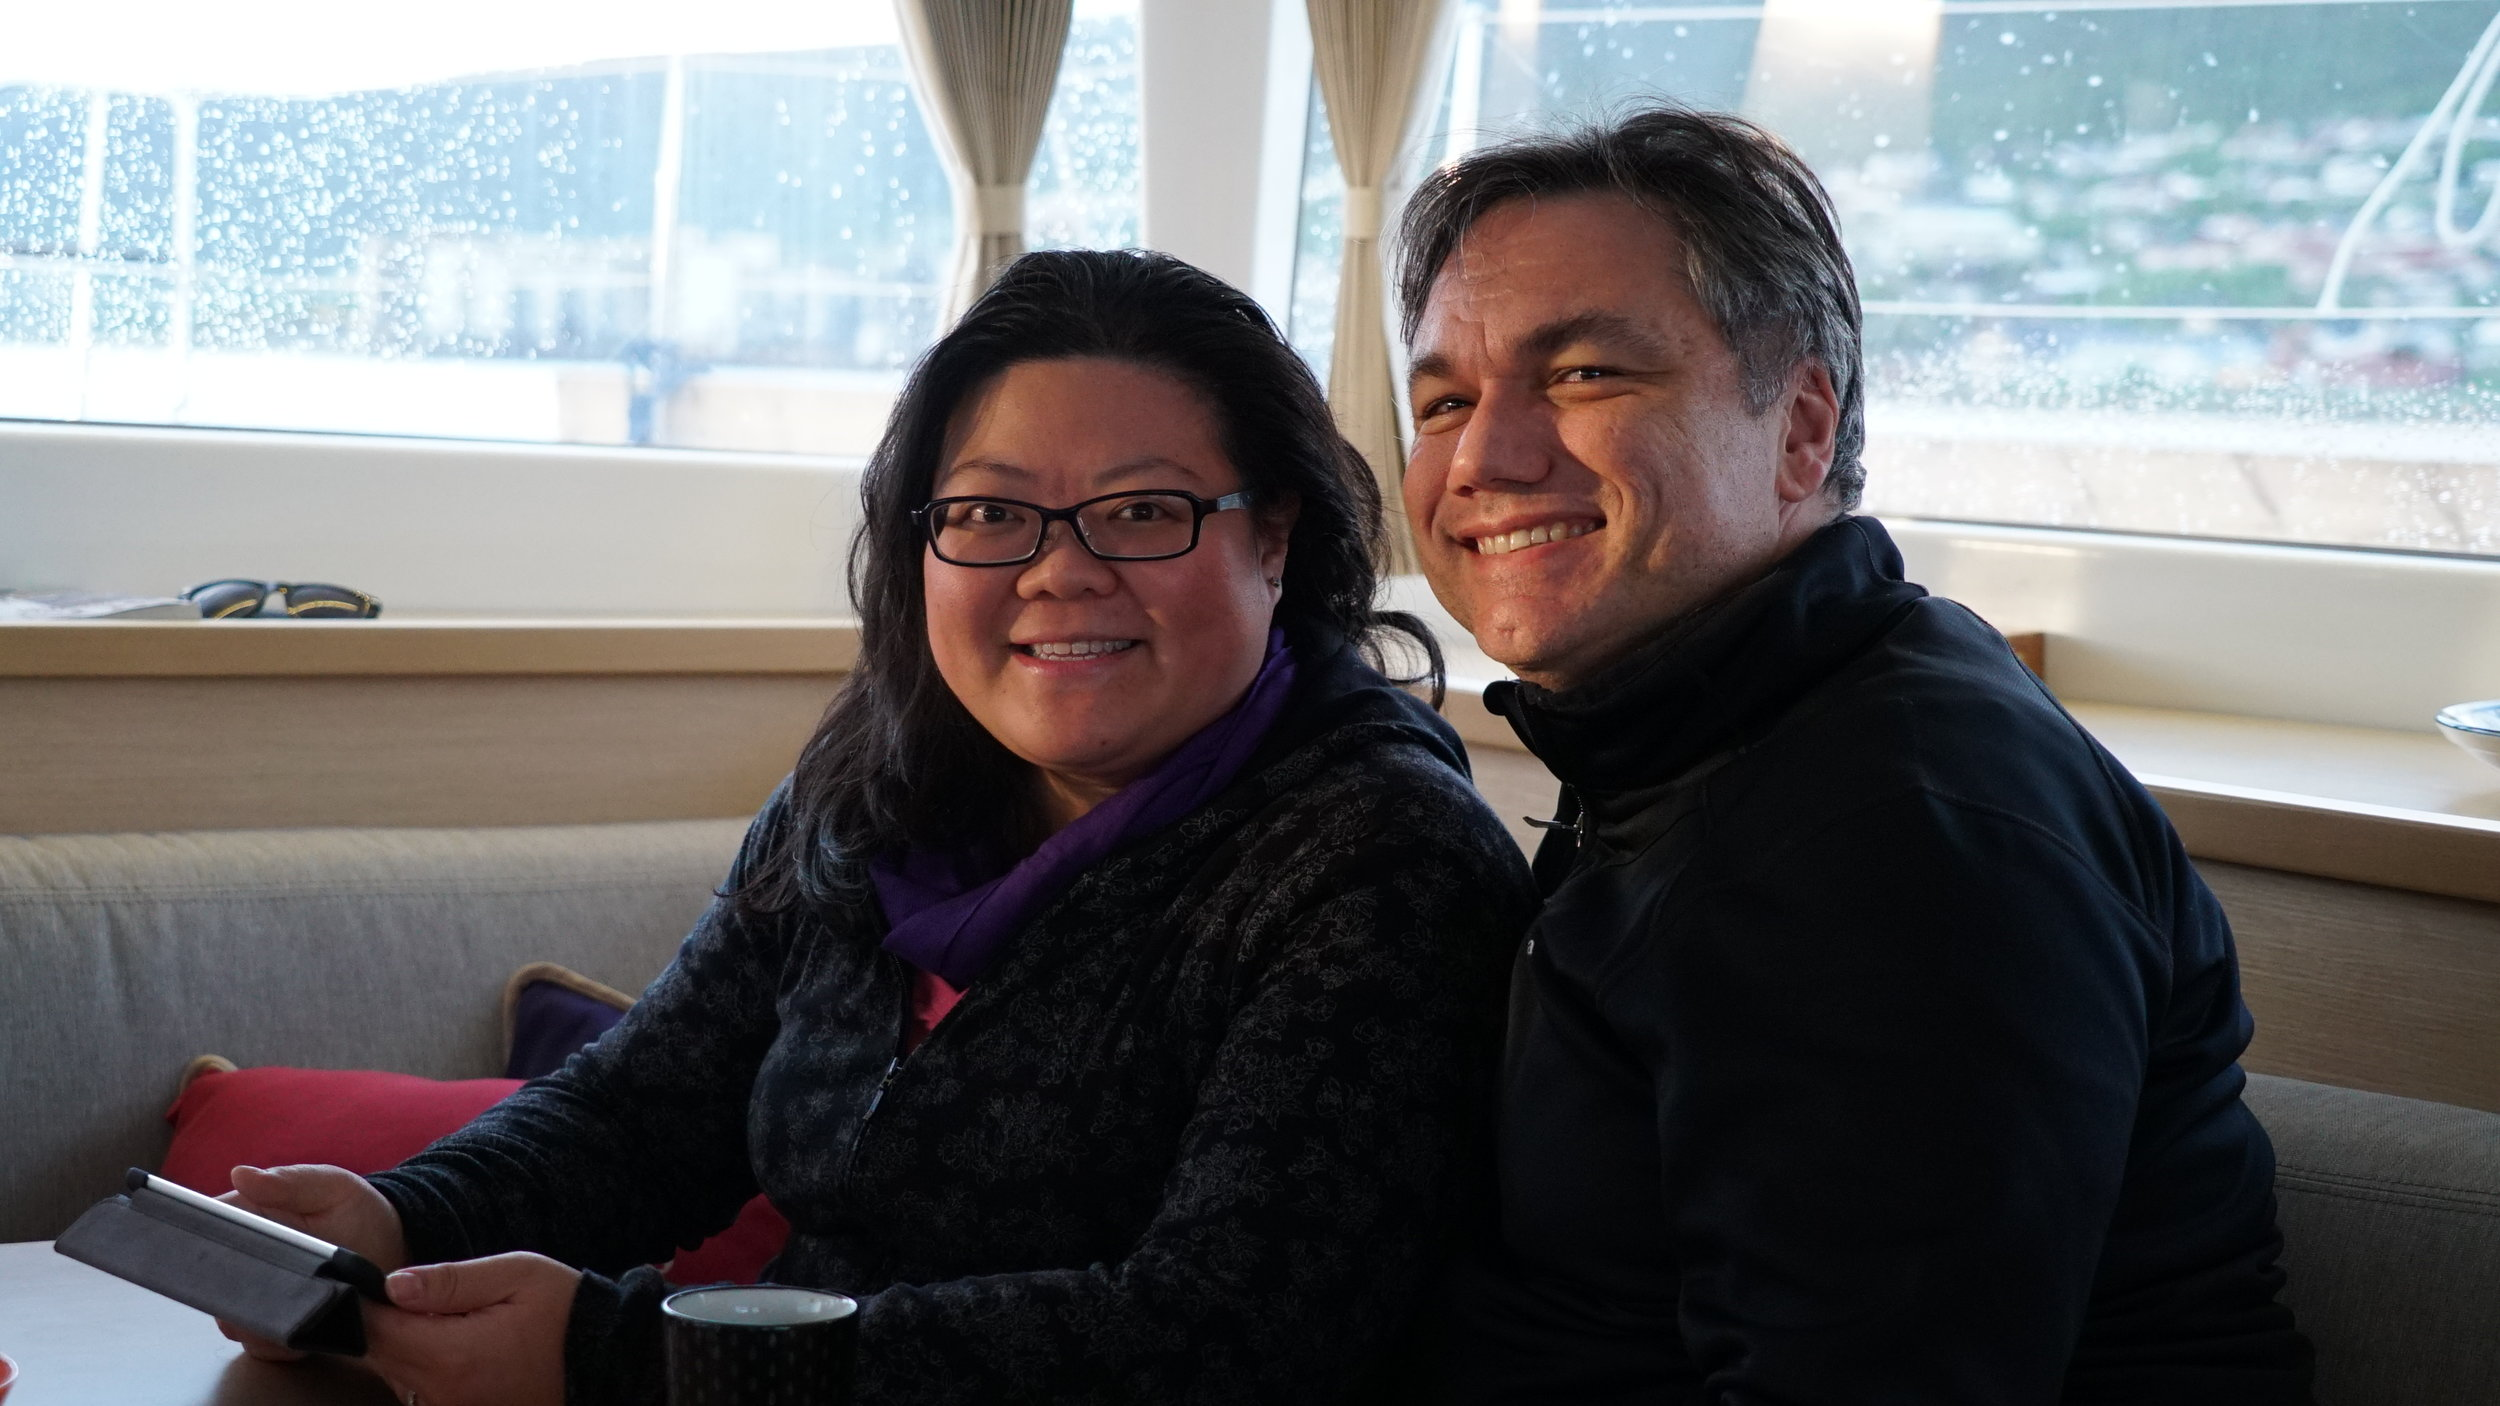 #Midnightsun Sailing | Arctic Princess |#Tromsø